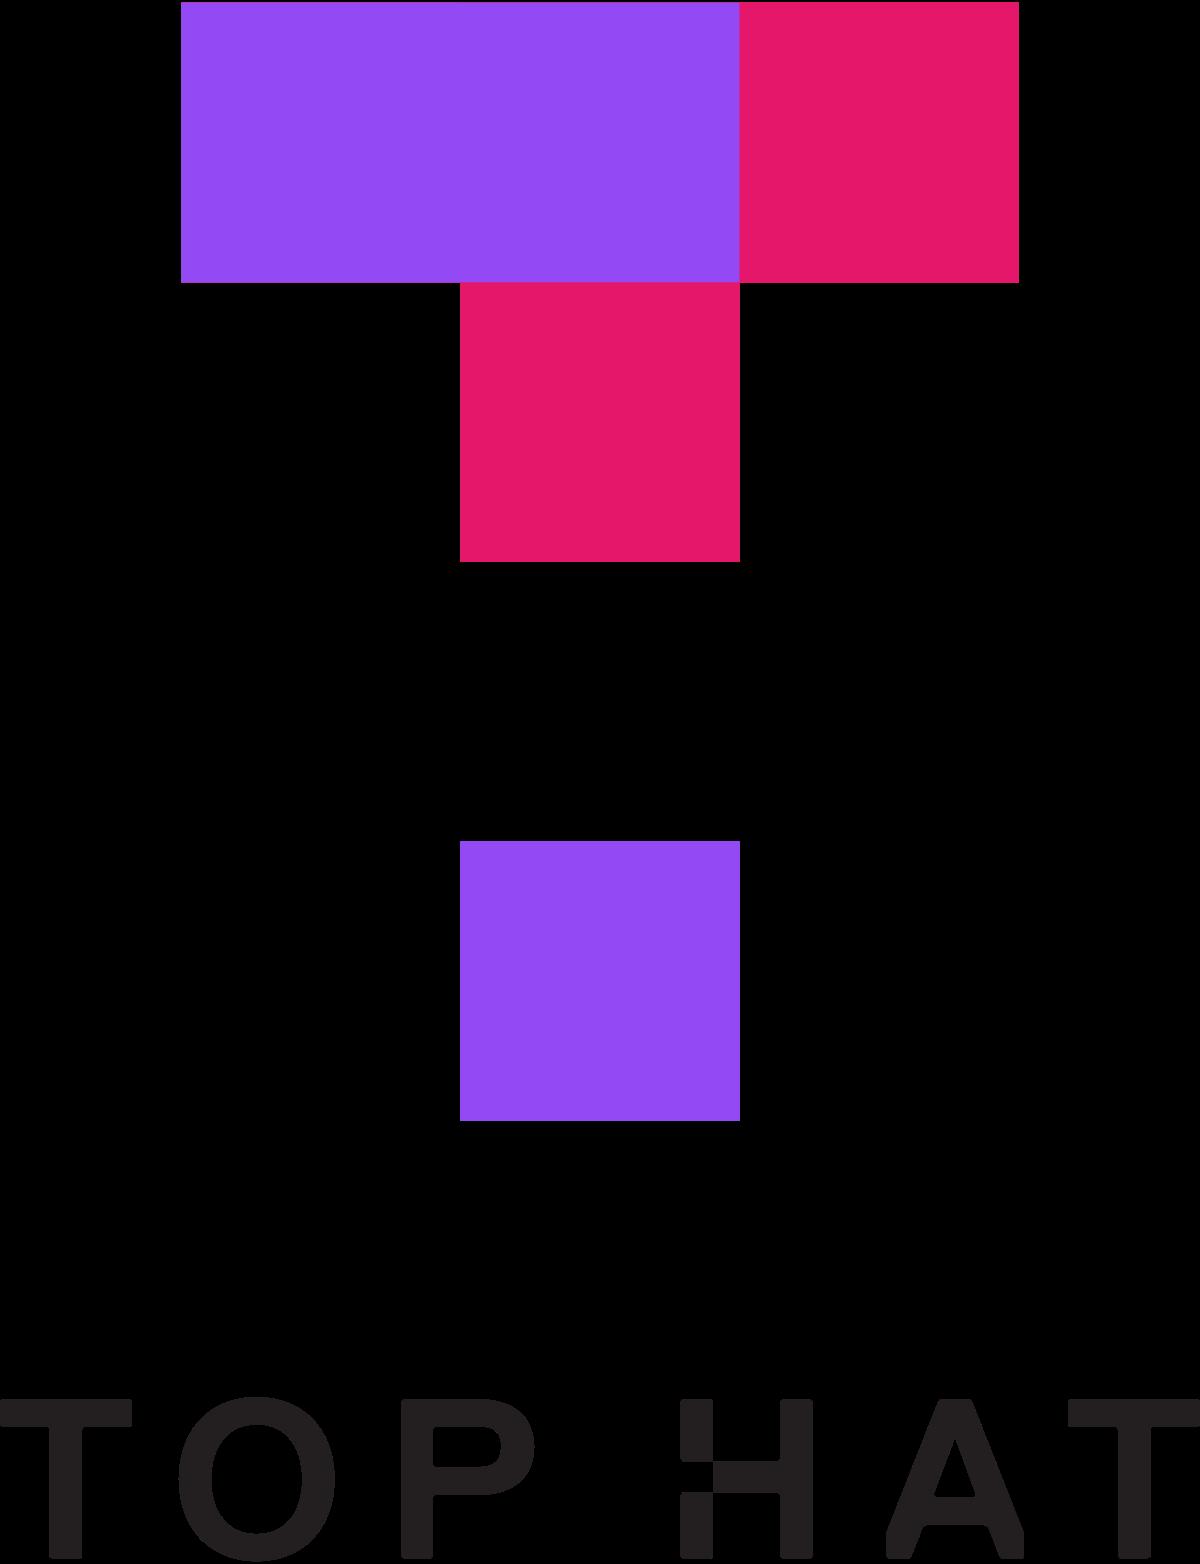 tophat logo.png